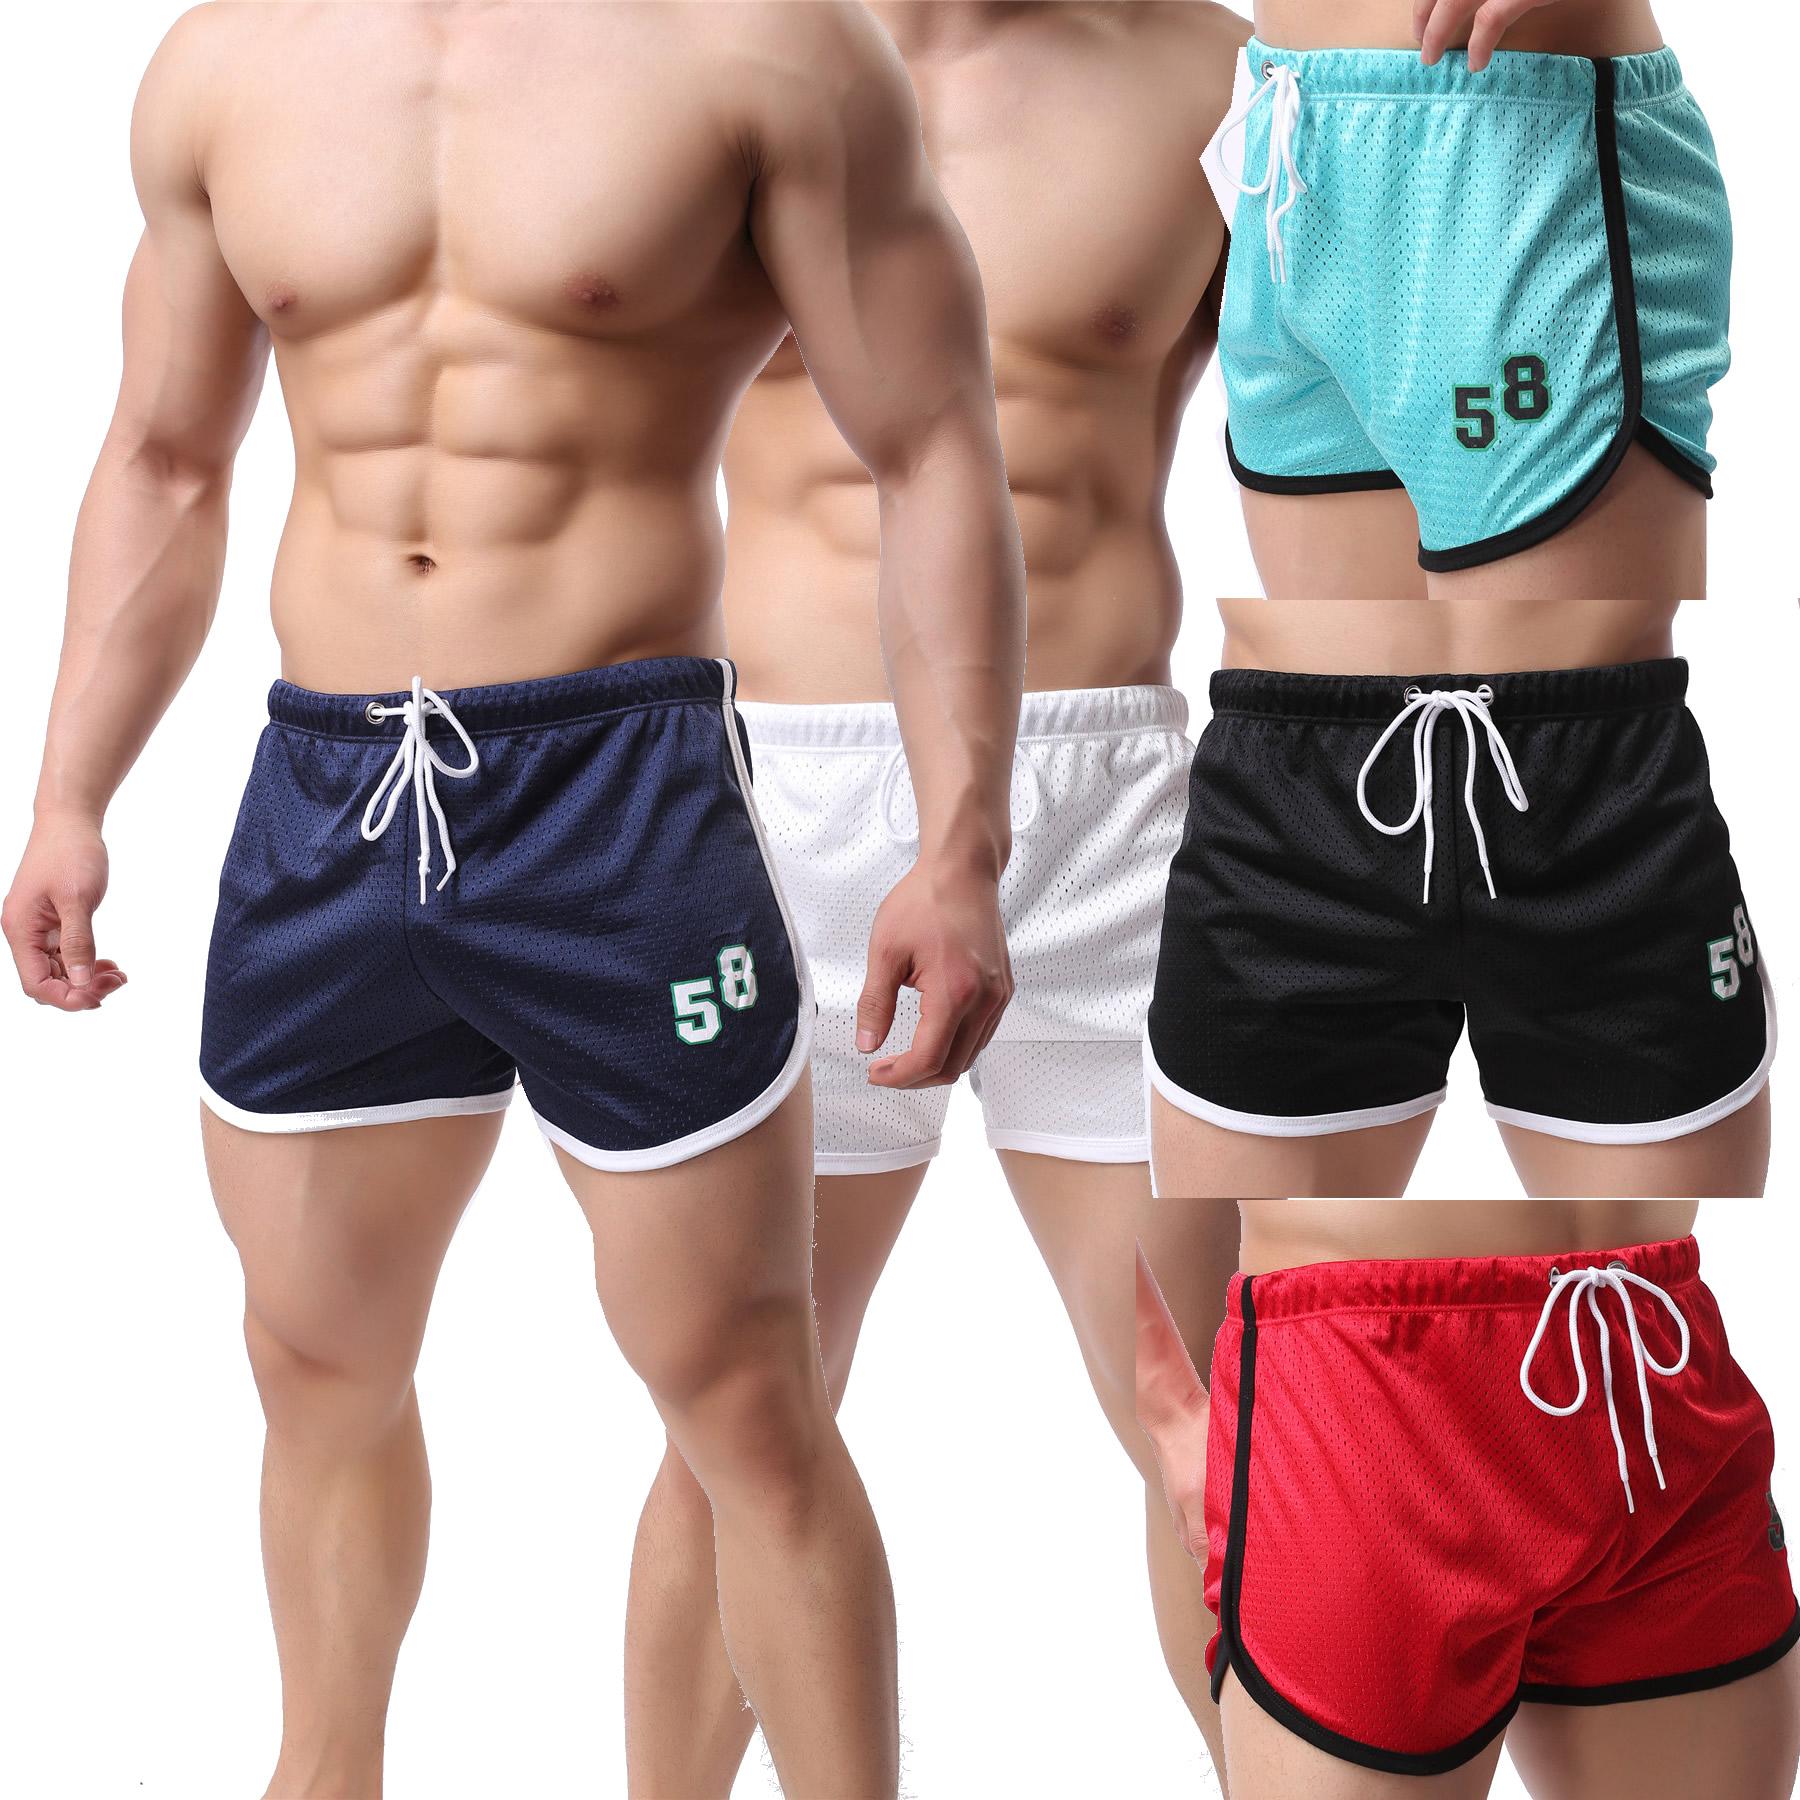 842e7d2812 Details about Mens Underwear Swimwear Swimming Trunks Swim Shorts Summer  Boxer Briefs Pants